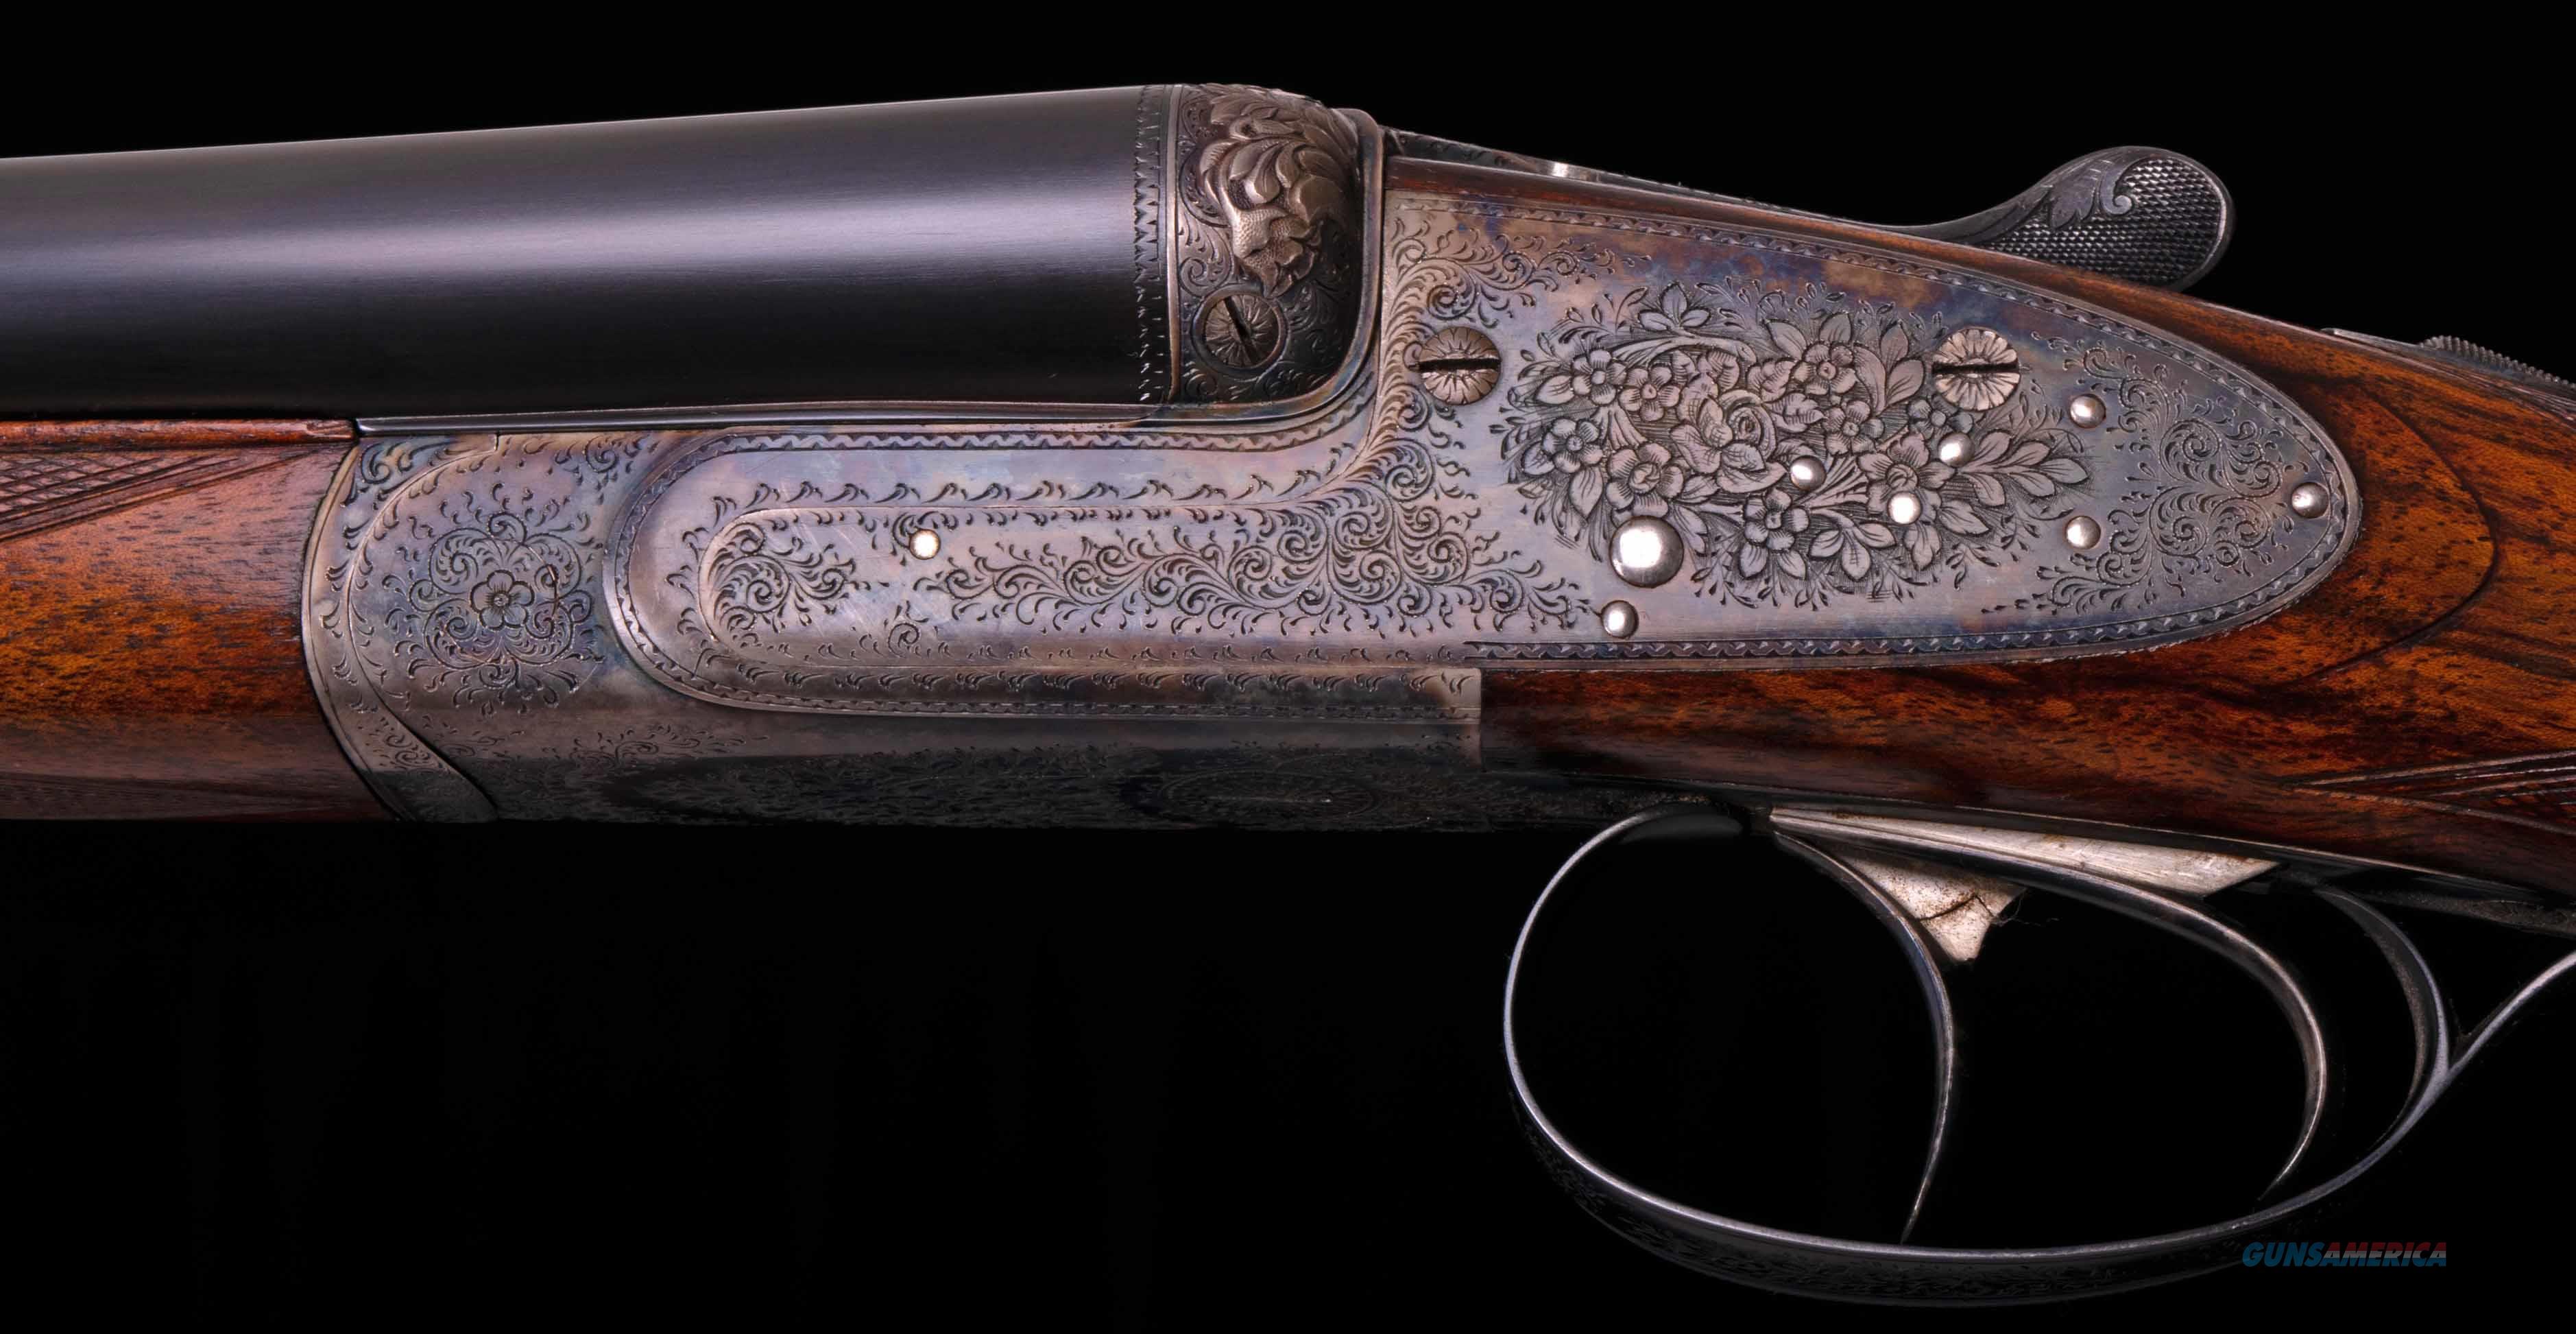 Dumoulin 20 Gauge Side by Side - SIDELOCK, BEST GUN, ROUND ACTION, vintage firearms inc  Guns > Shotguns > Dumoulin Shotguns